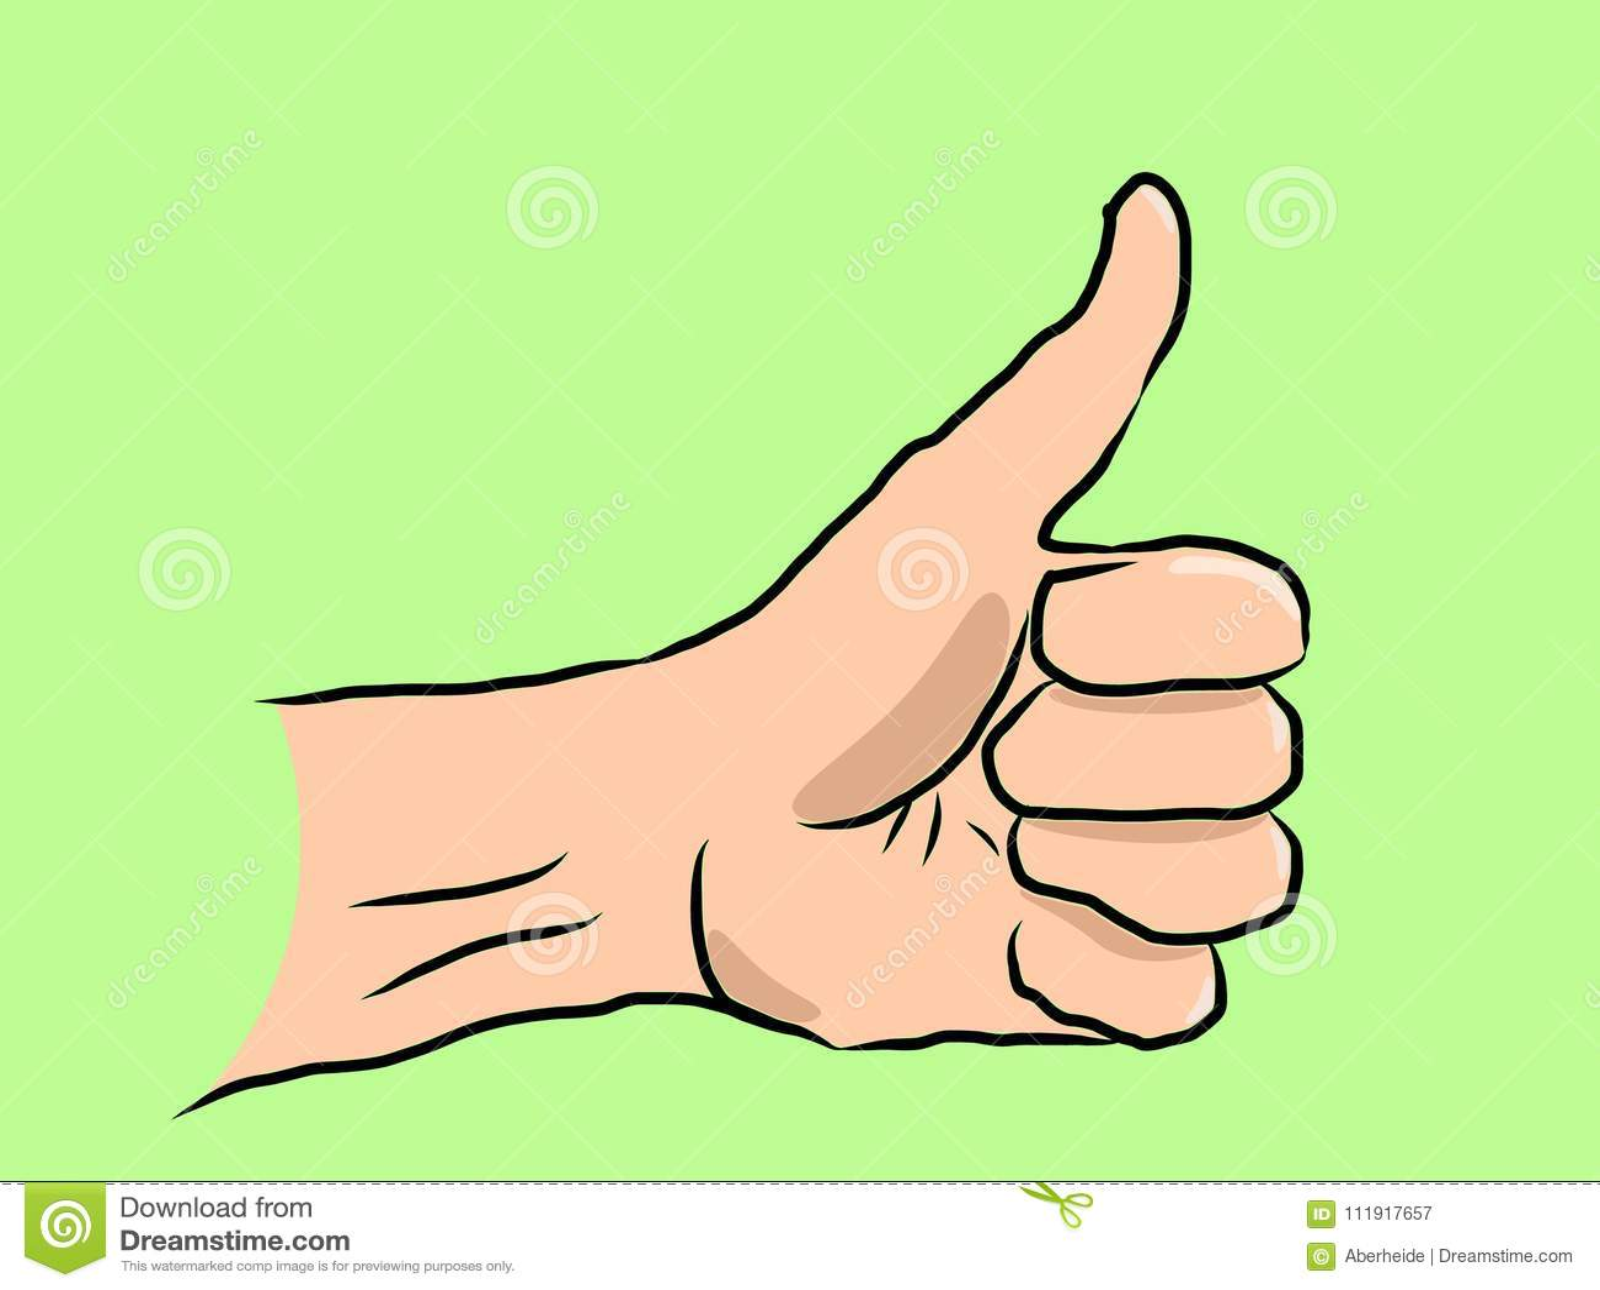 Hand drawn thumb up on green